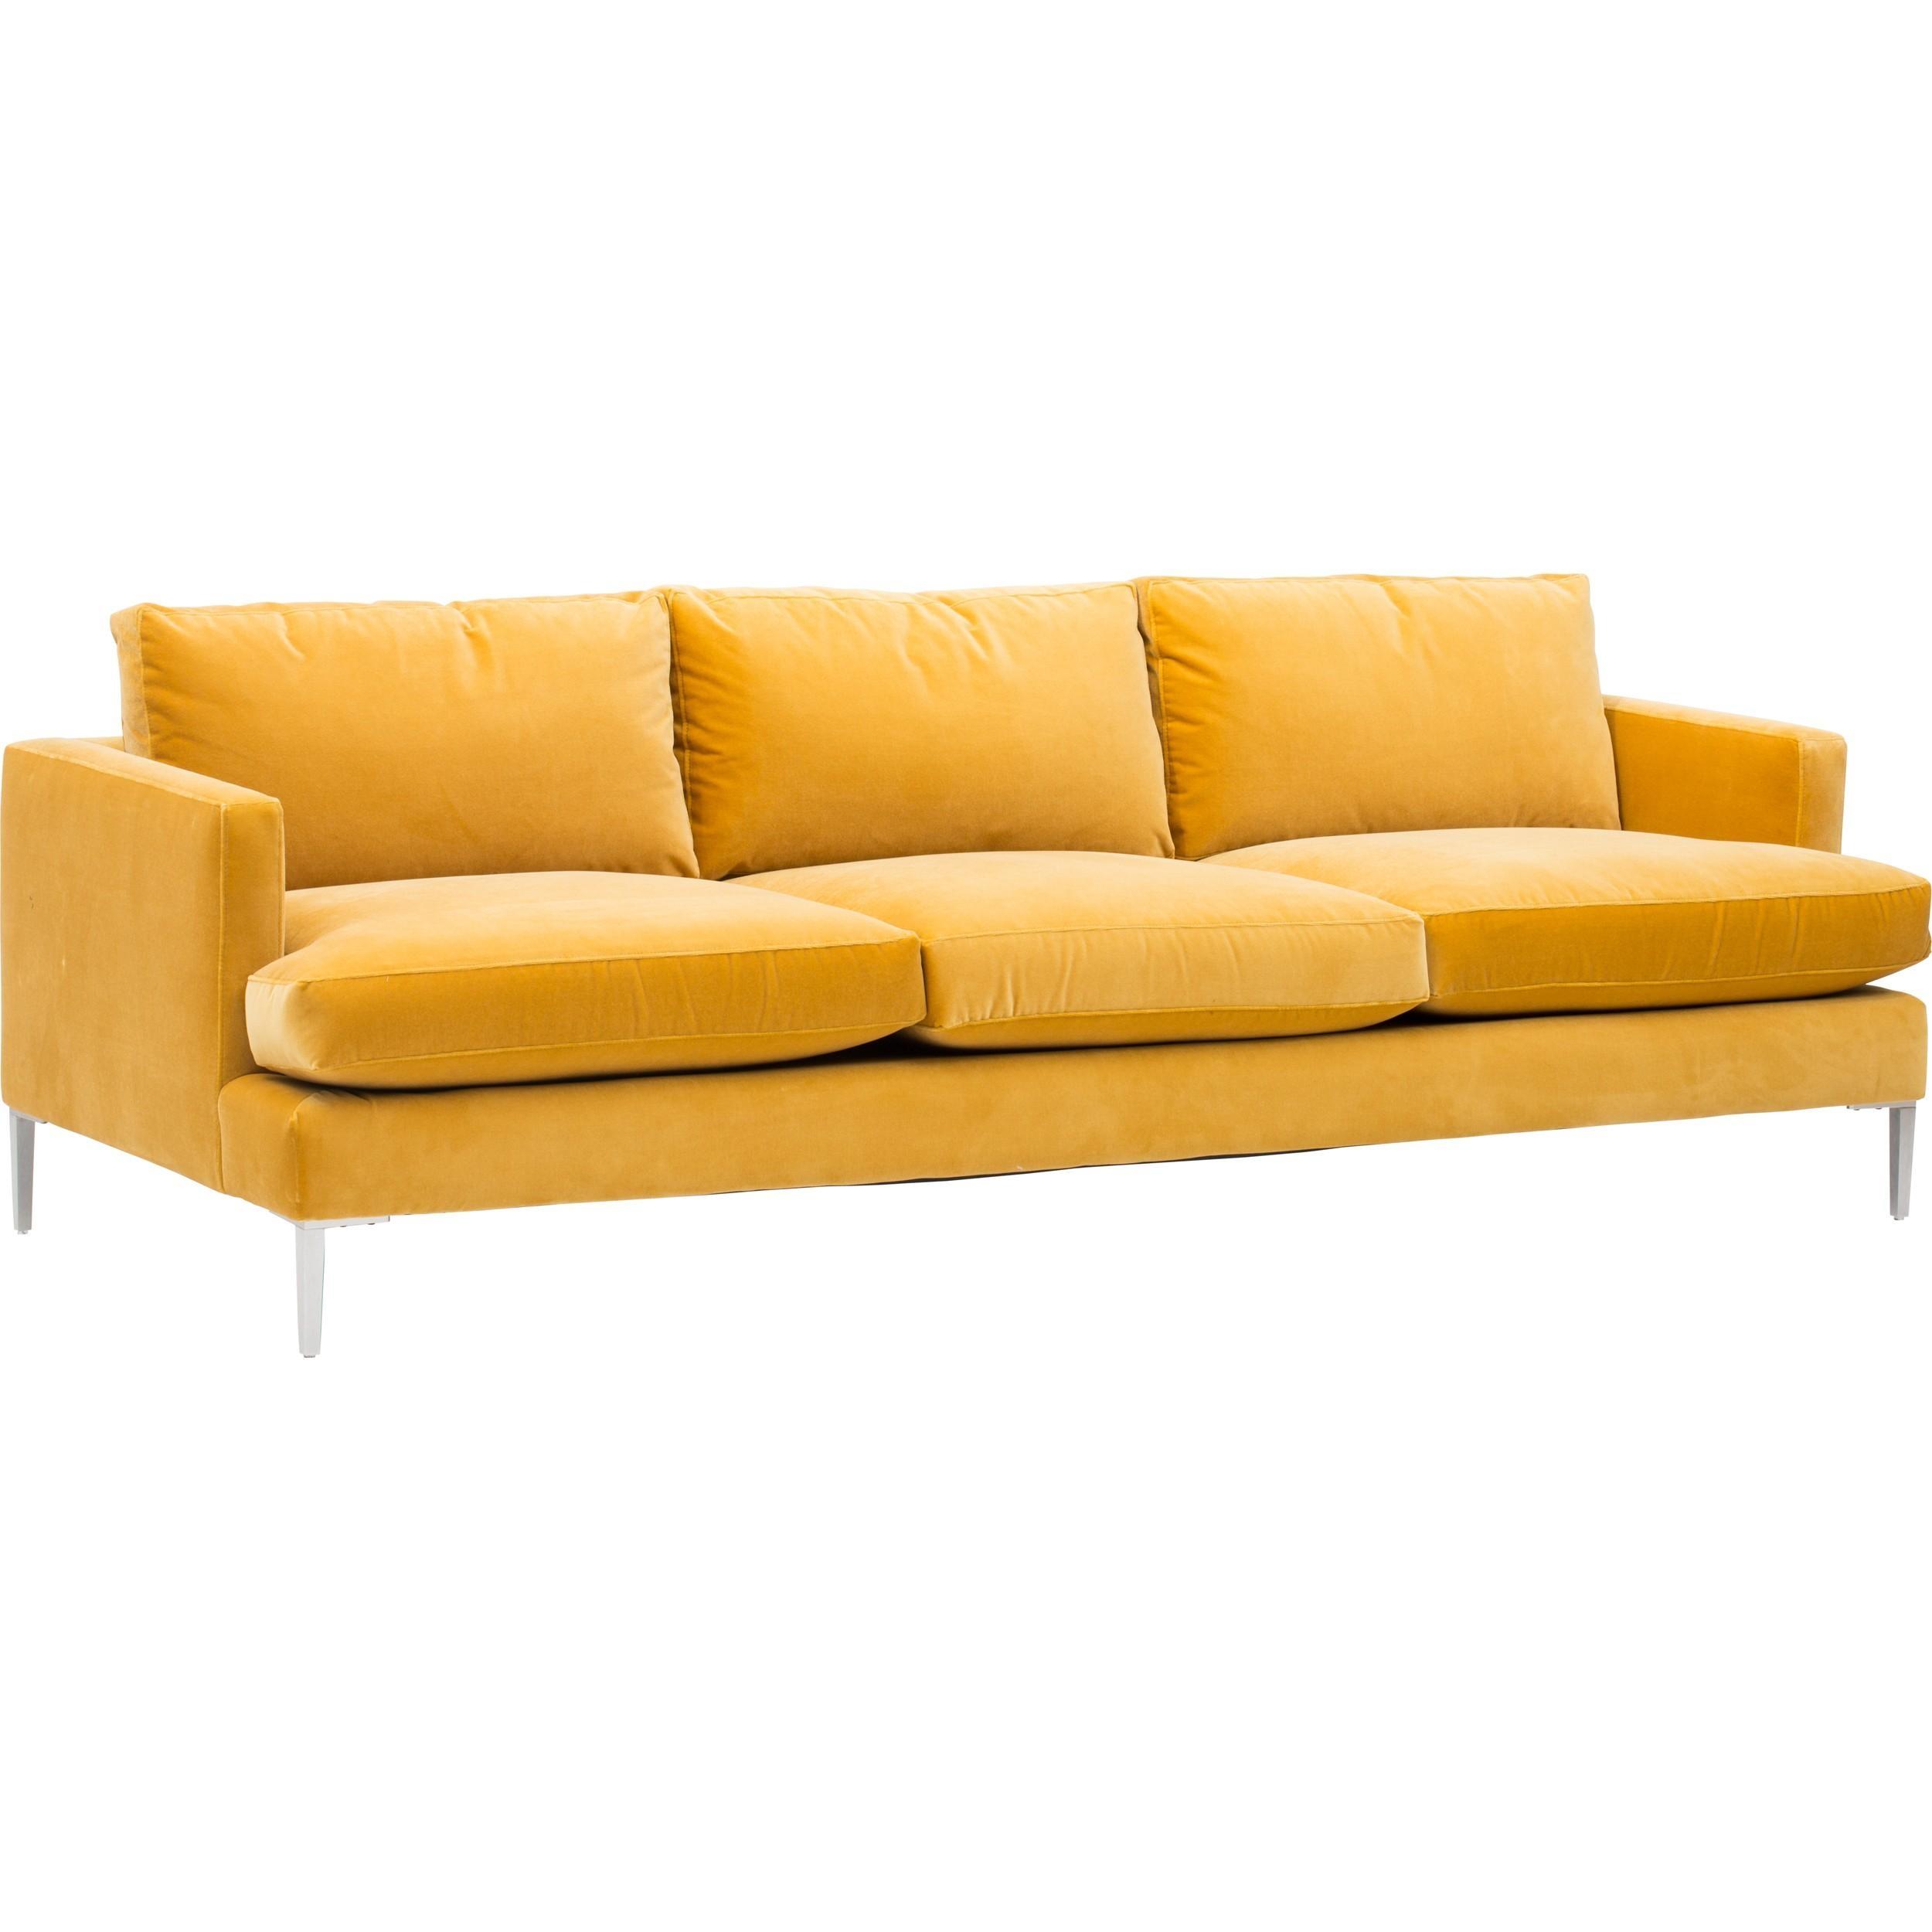 Beckham Sofa, Vance Gold – Fabric – Sofas – Furniture Inside Fabric Sofas (View 7 of 20)